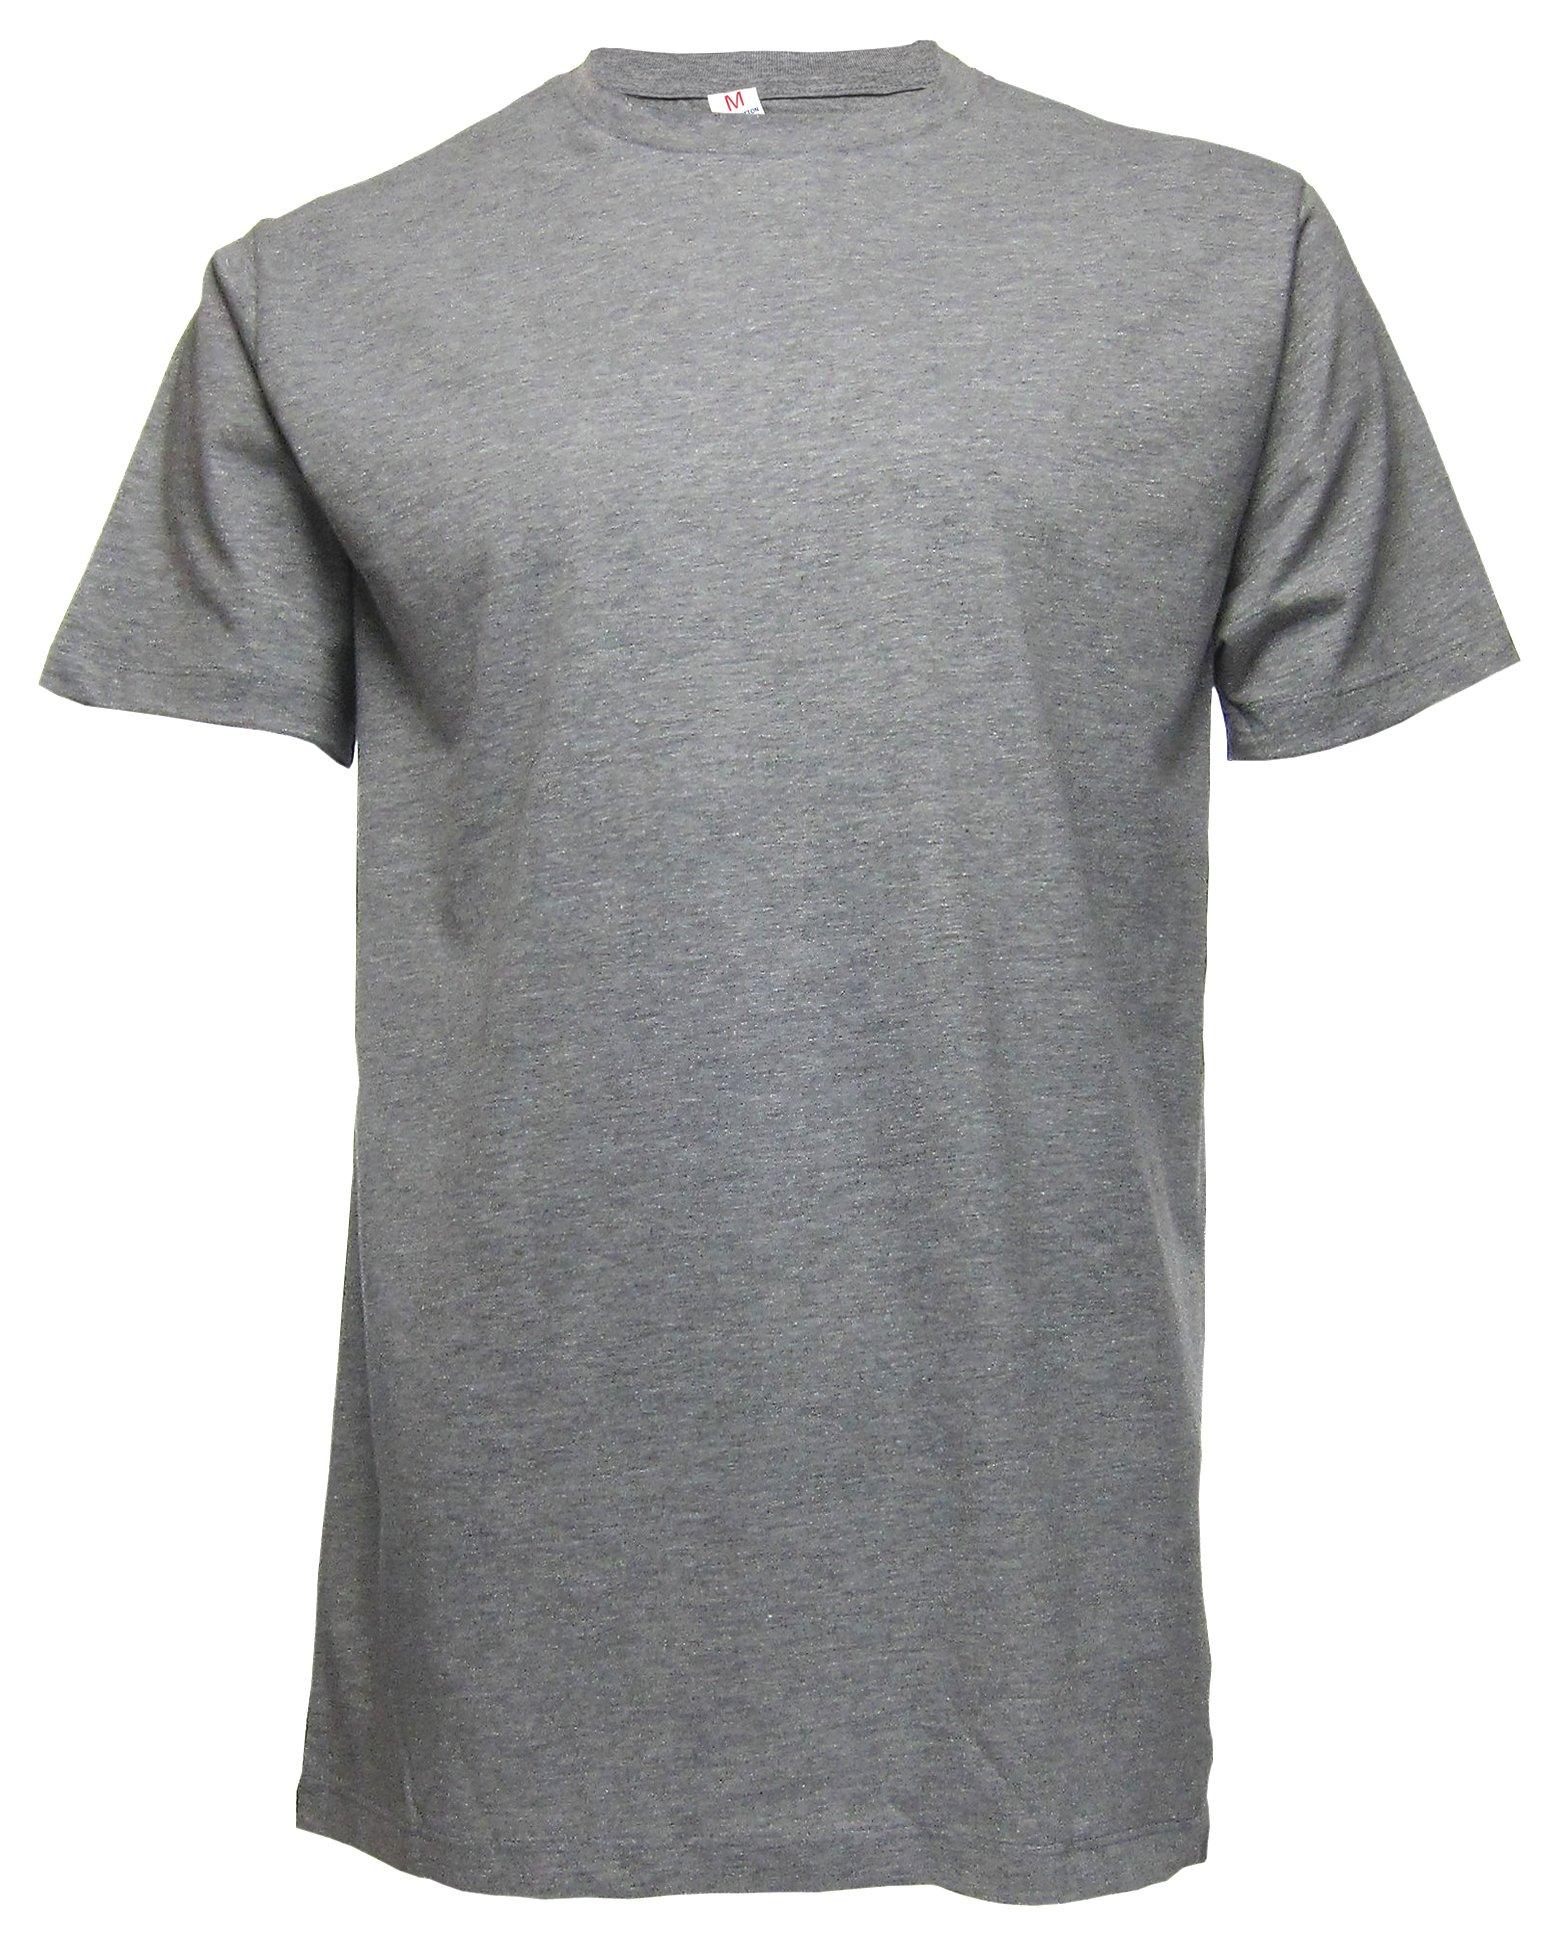 King's Love Men's Lightweight Solid Crew Neck Short Sleeve Premium Ringspun Cotton Blend EcoSafe Blank T-Shirt (Large, Heather Grey)